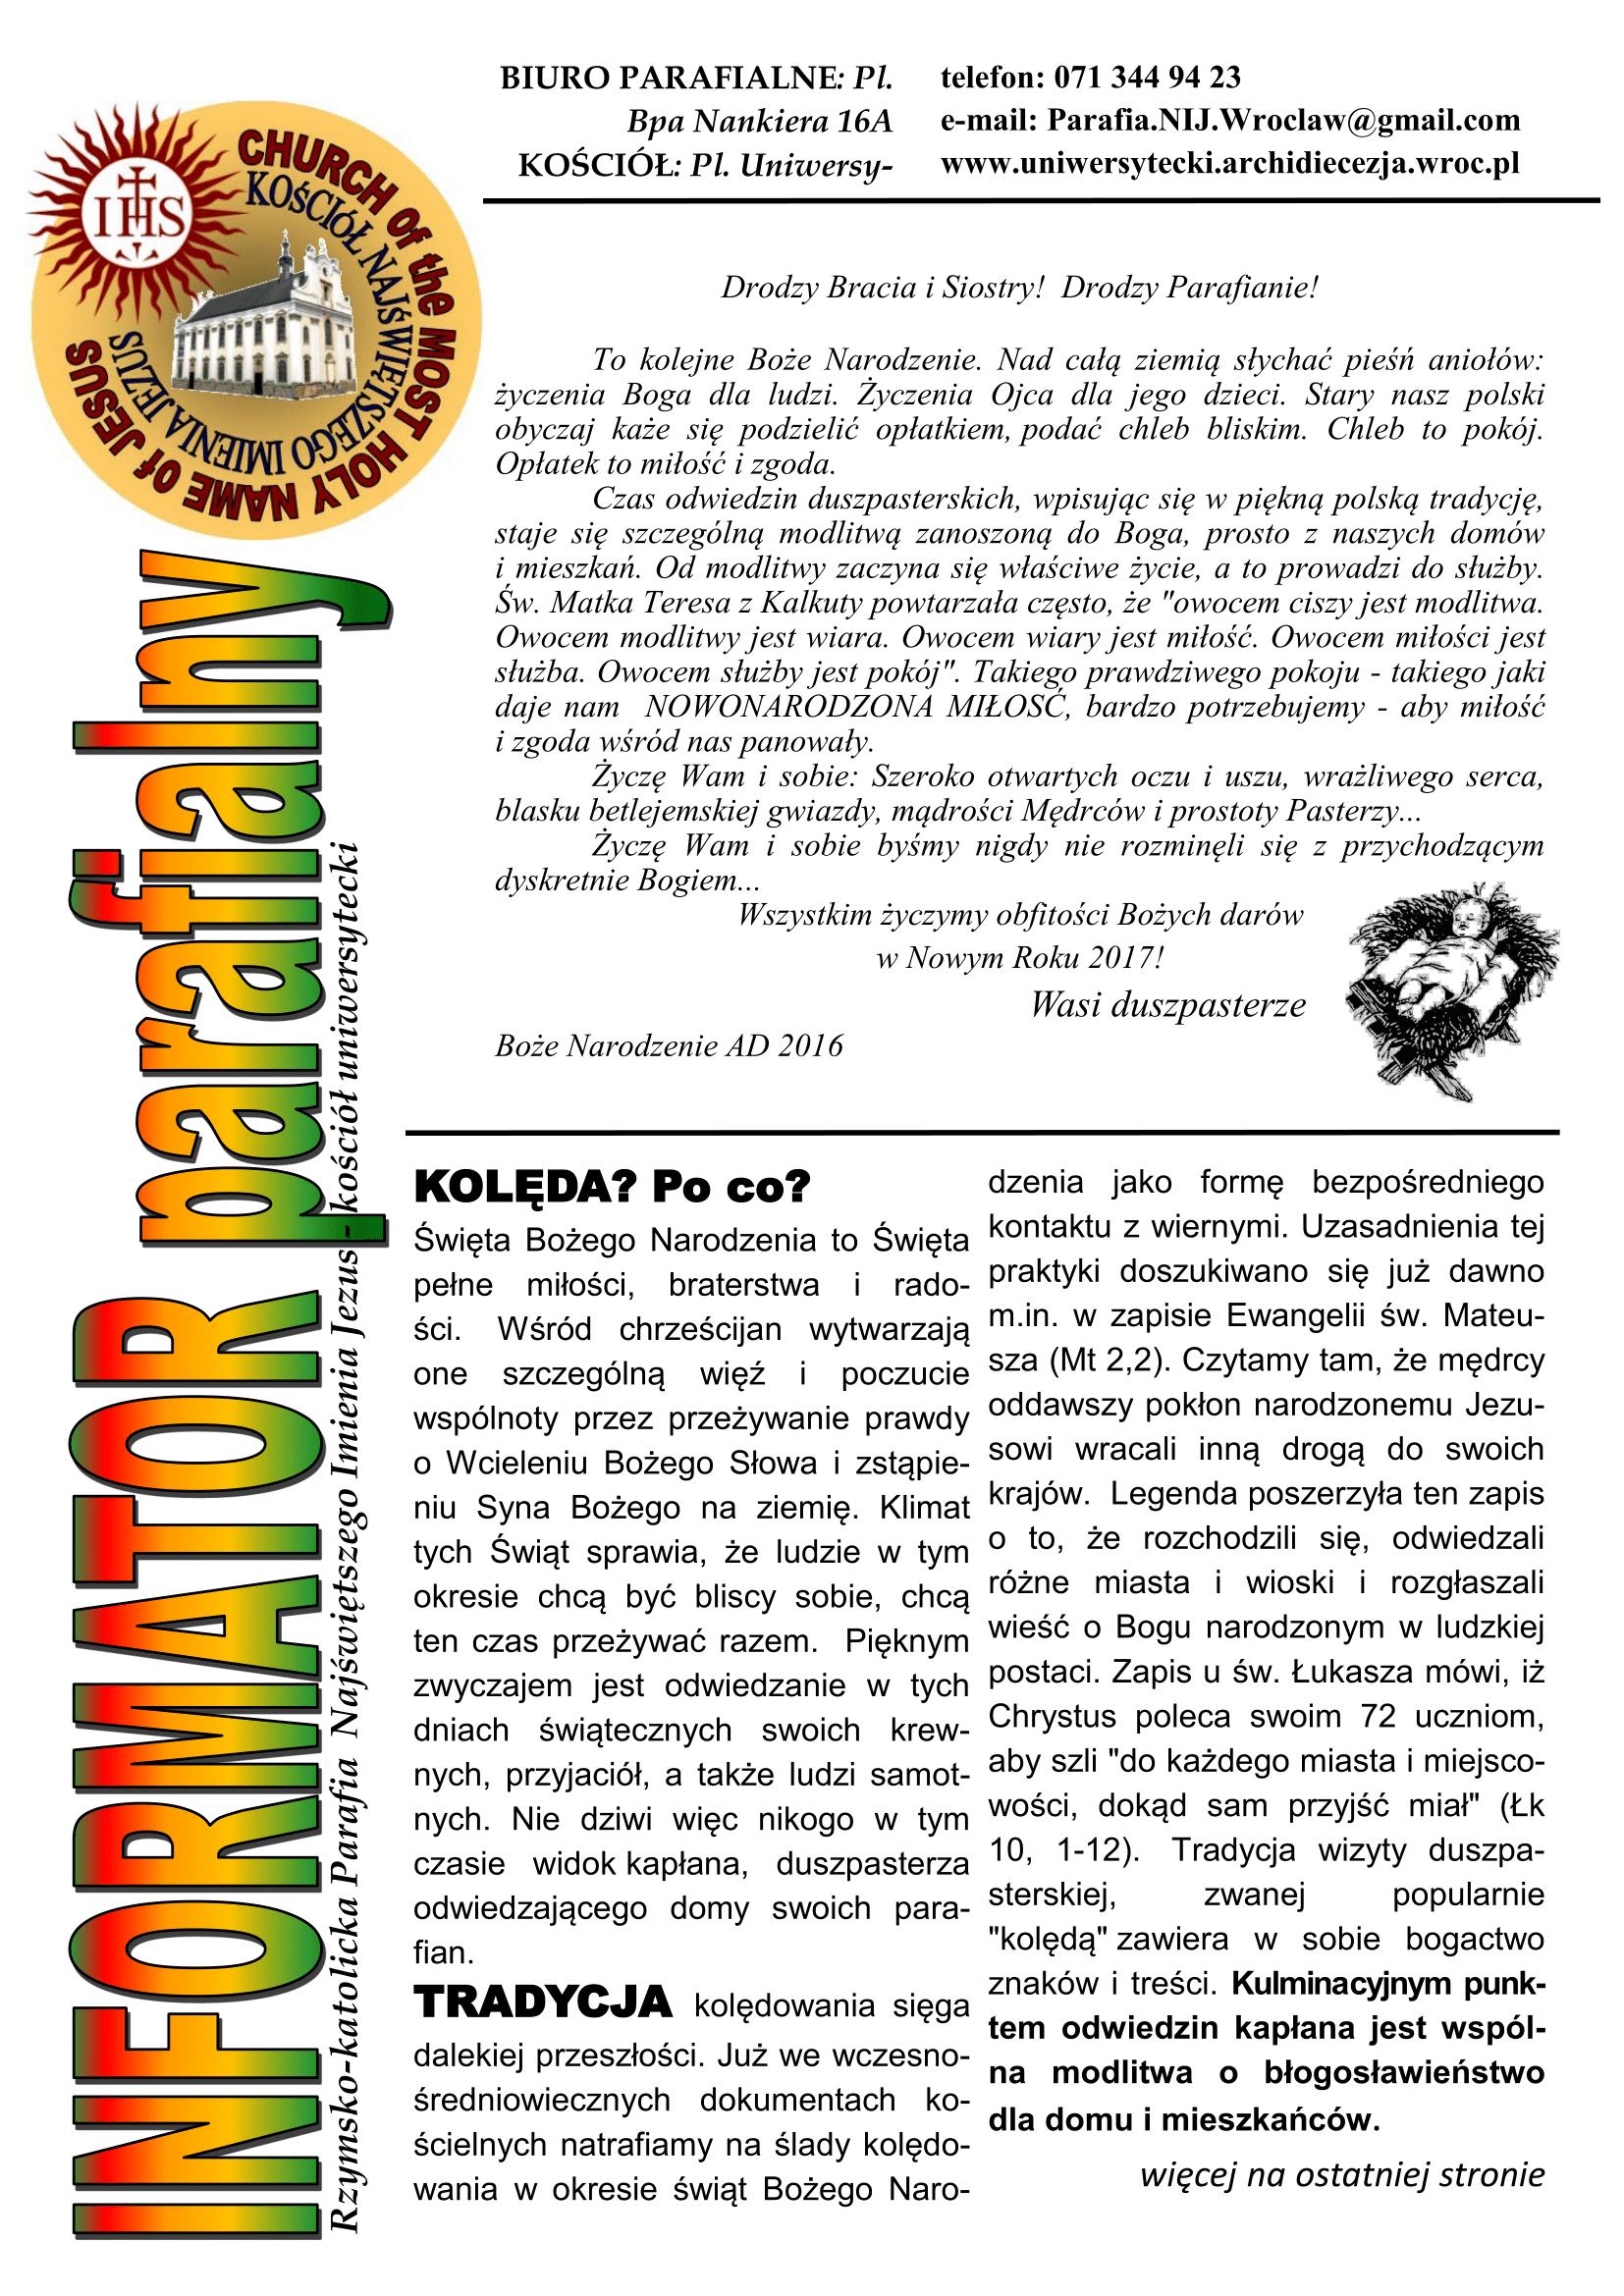 BIULETYN 9 Koleda 2017